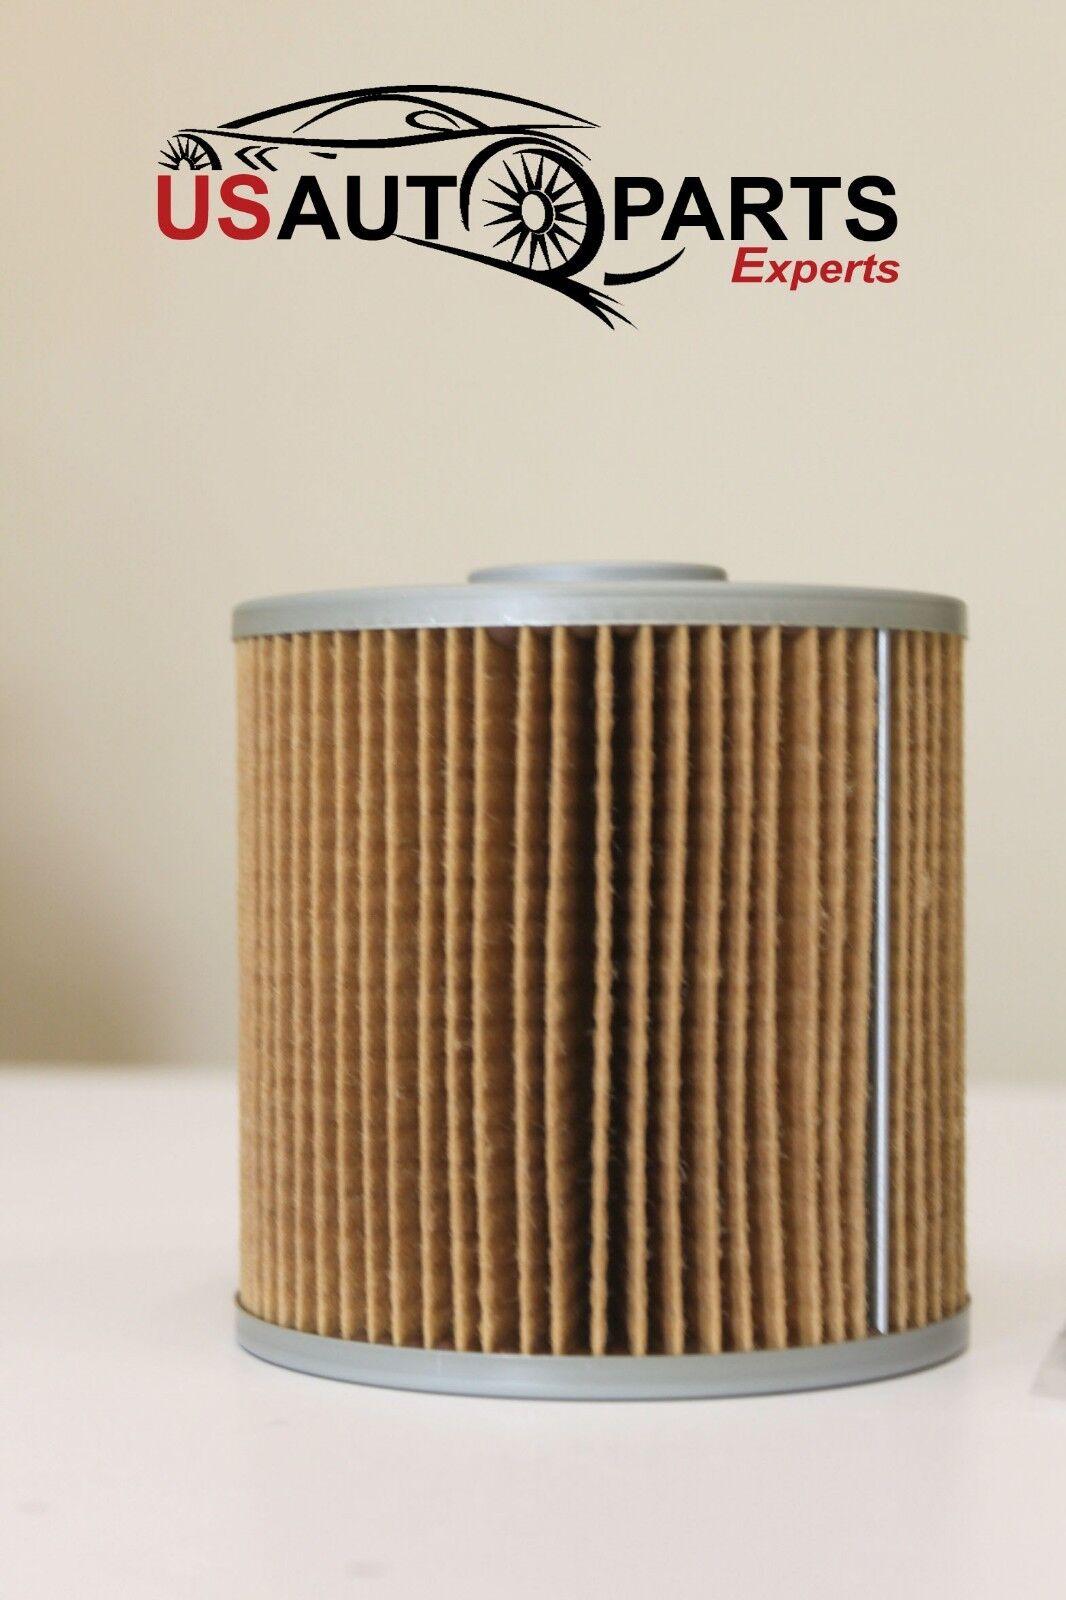 1132401940 Frr Filter ISUZU Fuel 6HK1-7.8L